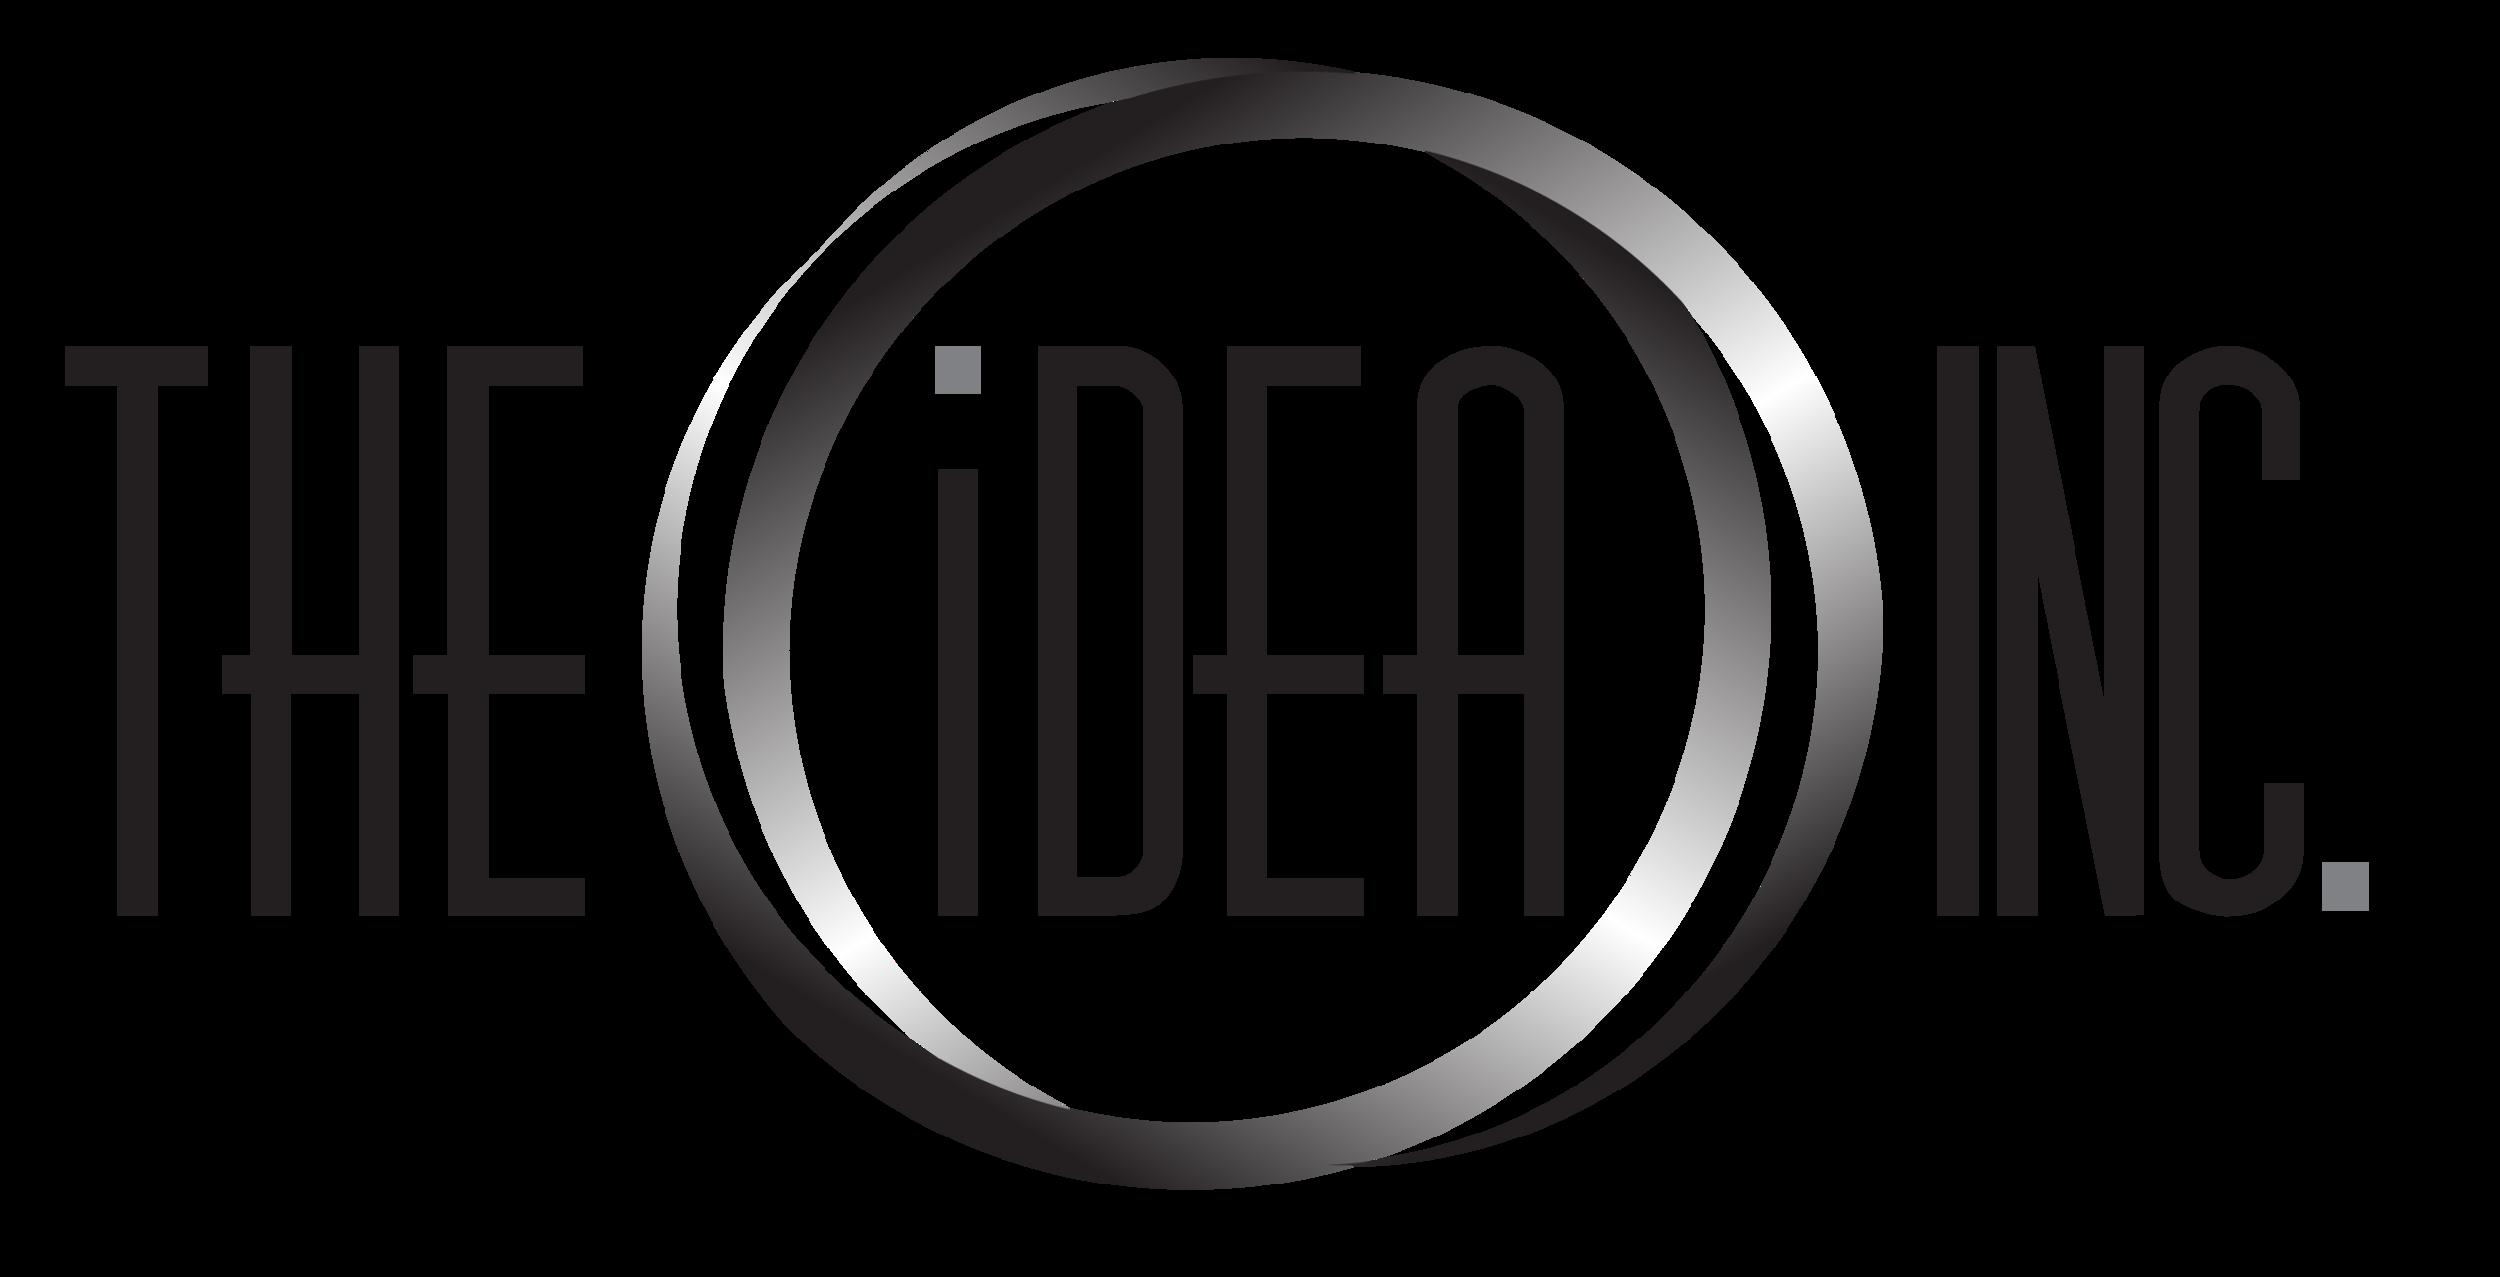 The-Idea-Inc-logo-gradient-lrg.png